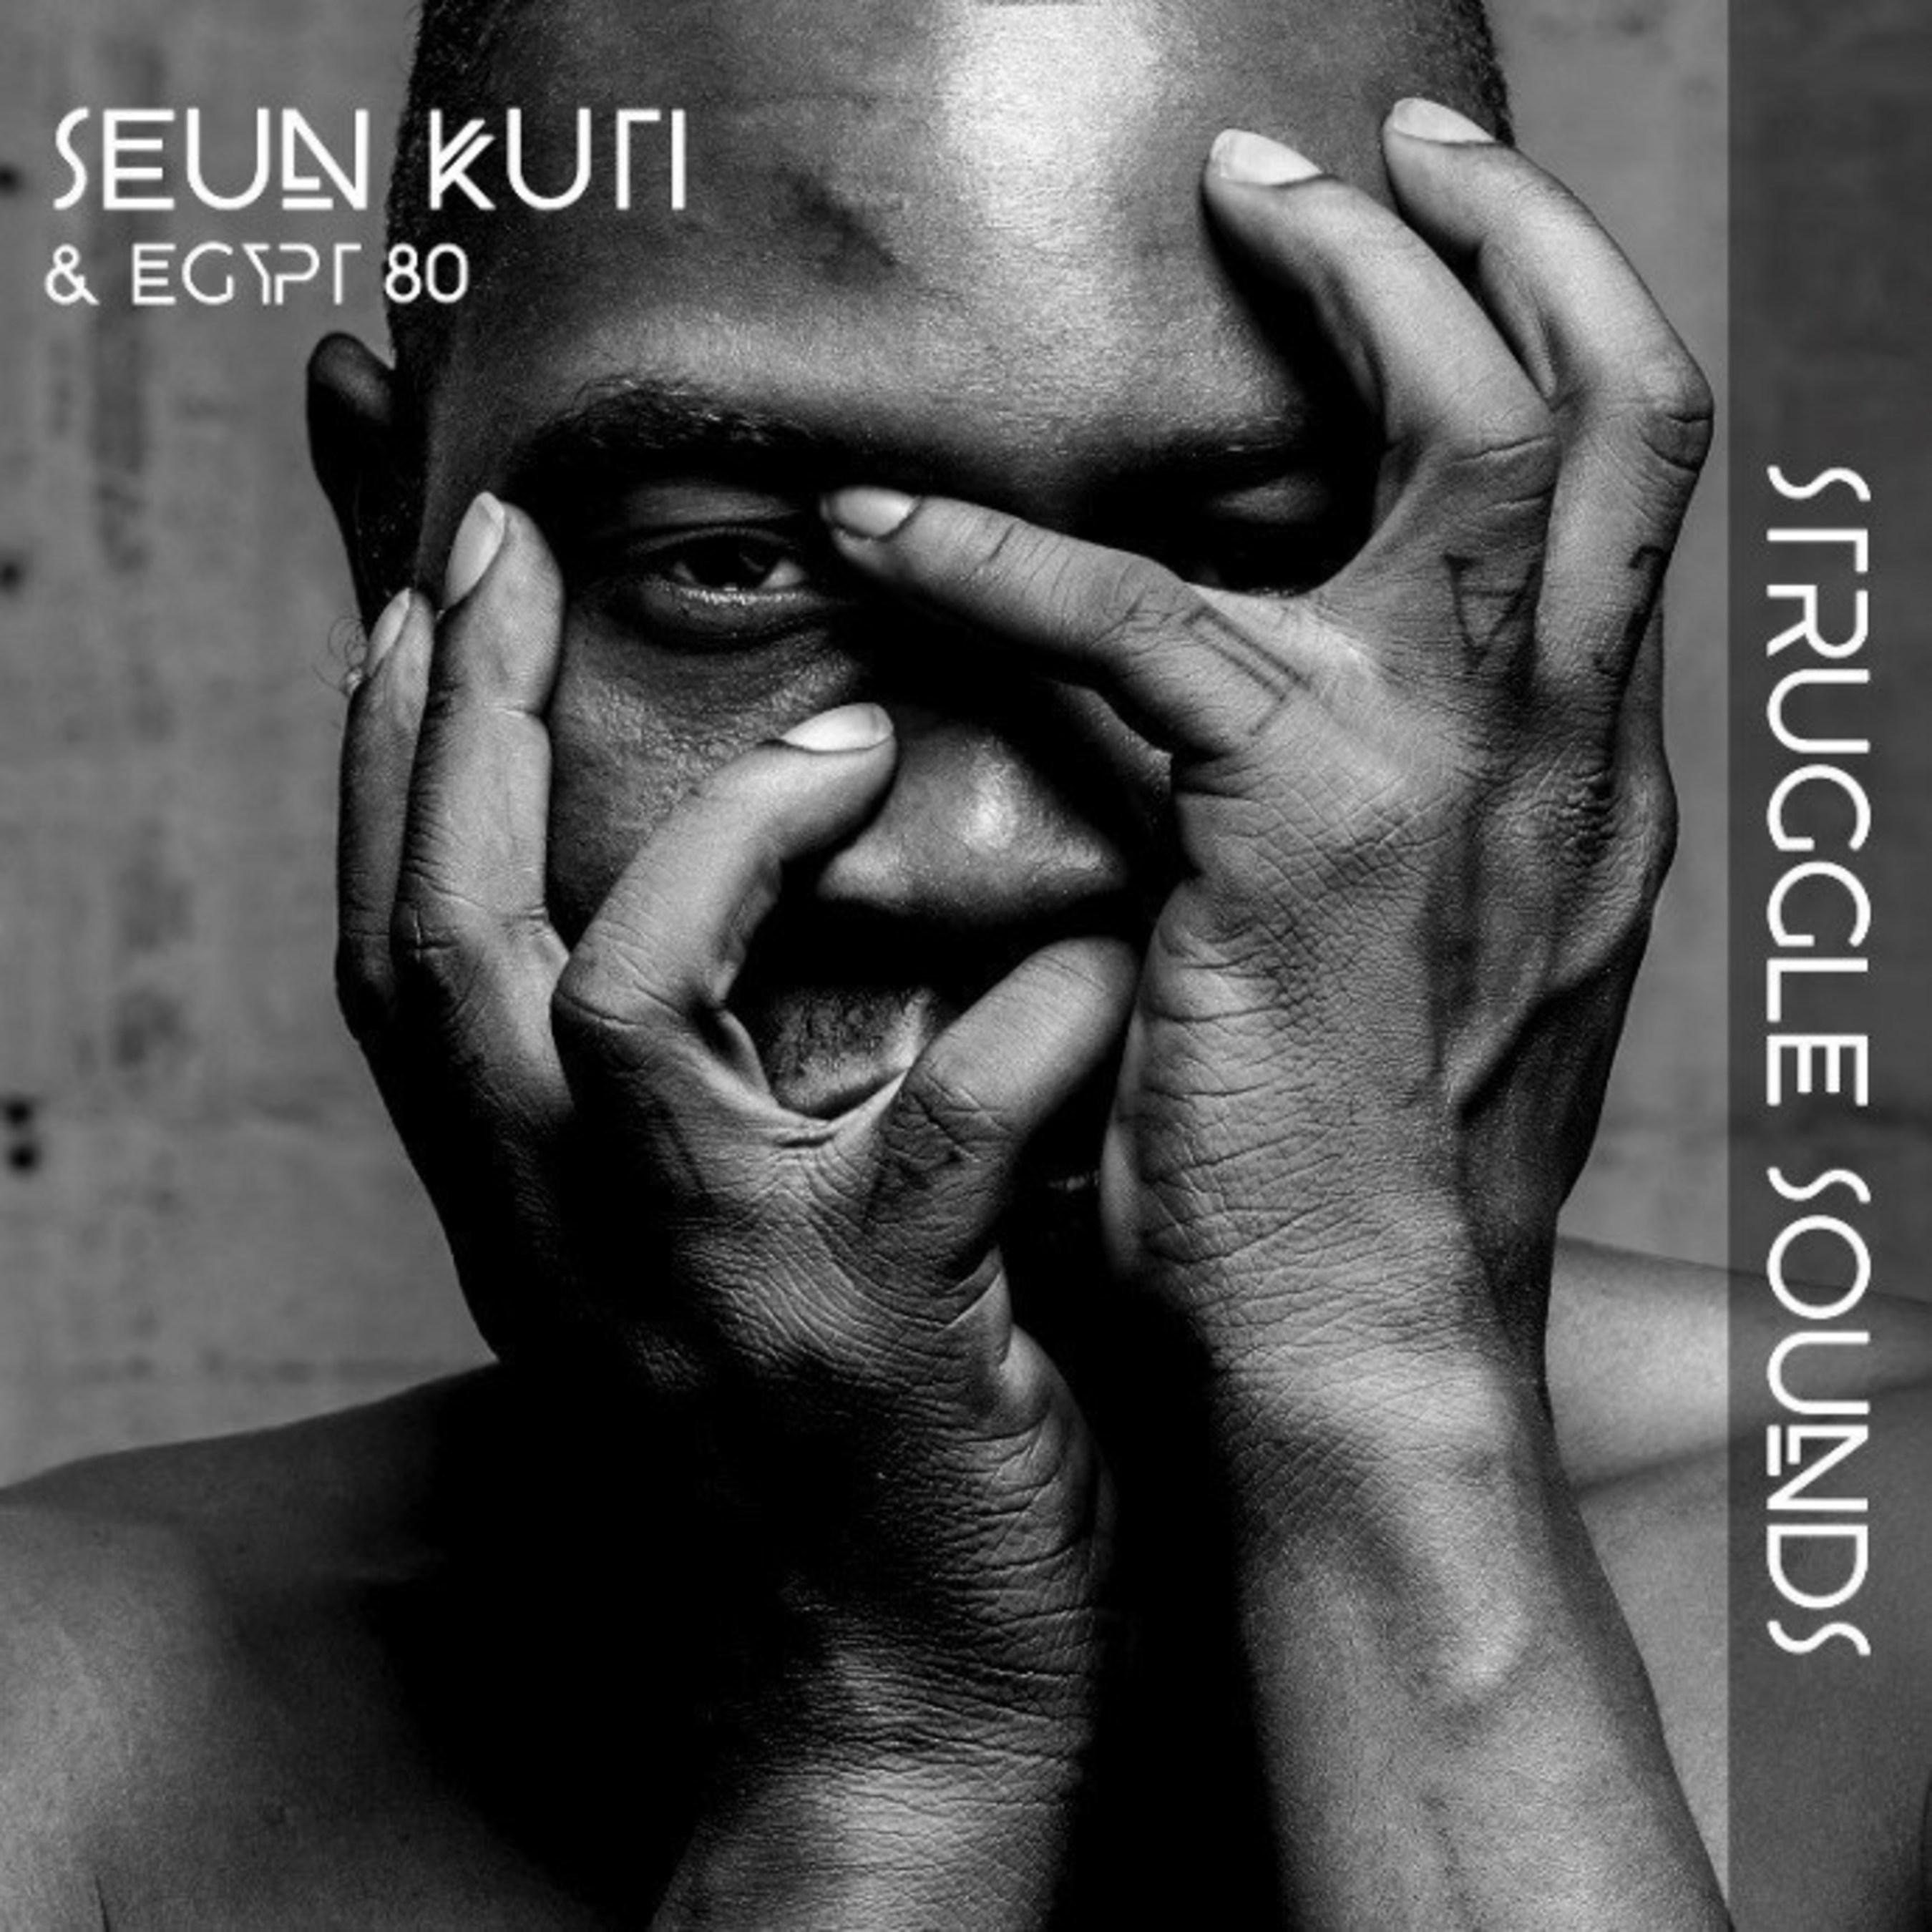 Seun Kuti - Son Of Afrobeat Legend Fela Kuti Releases New EP